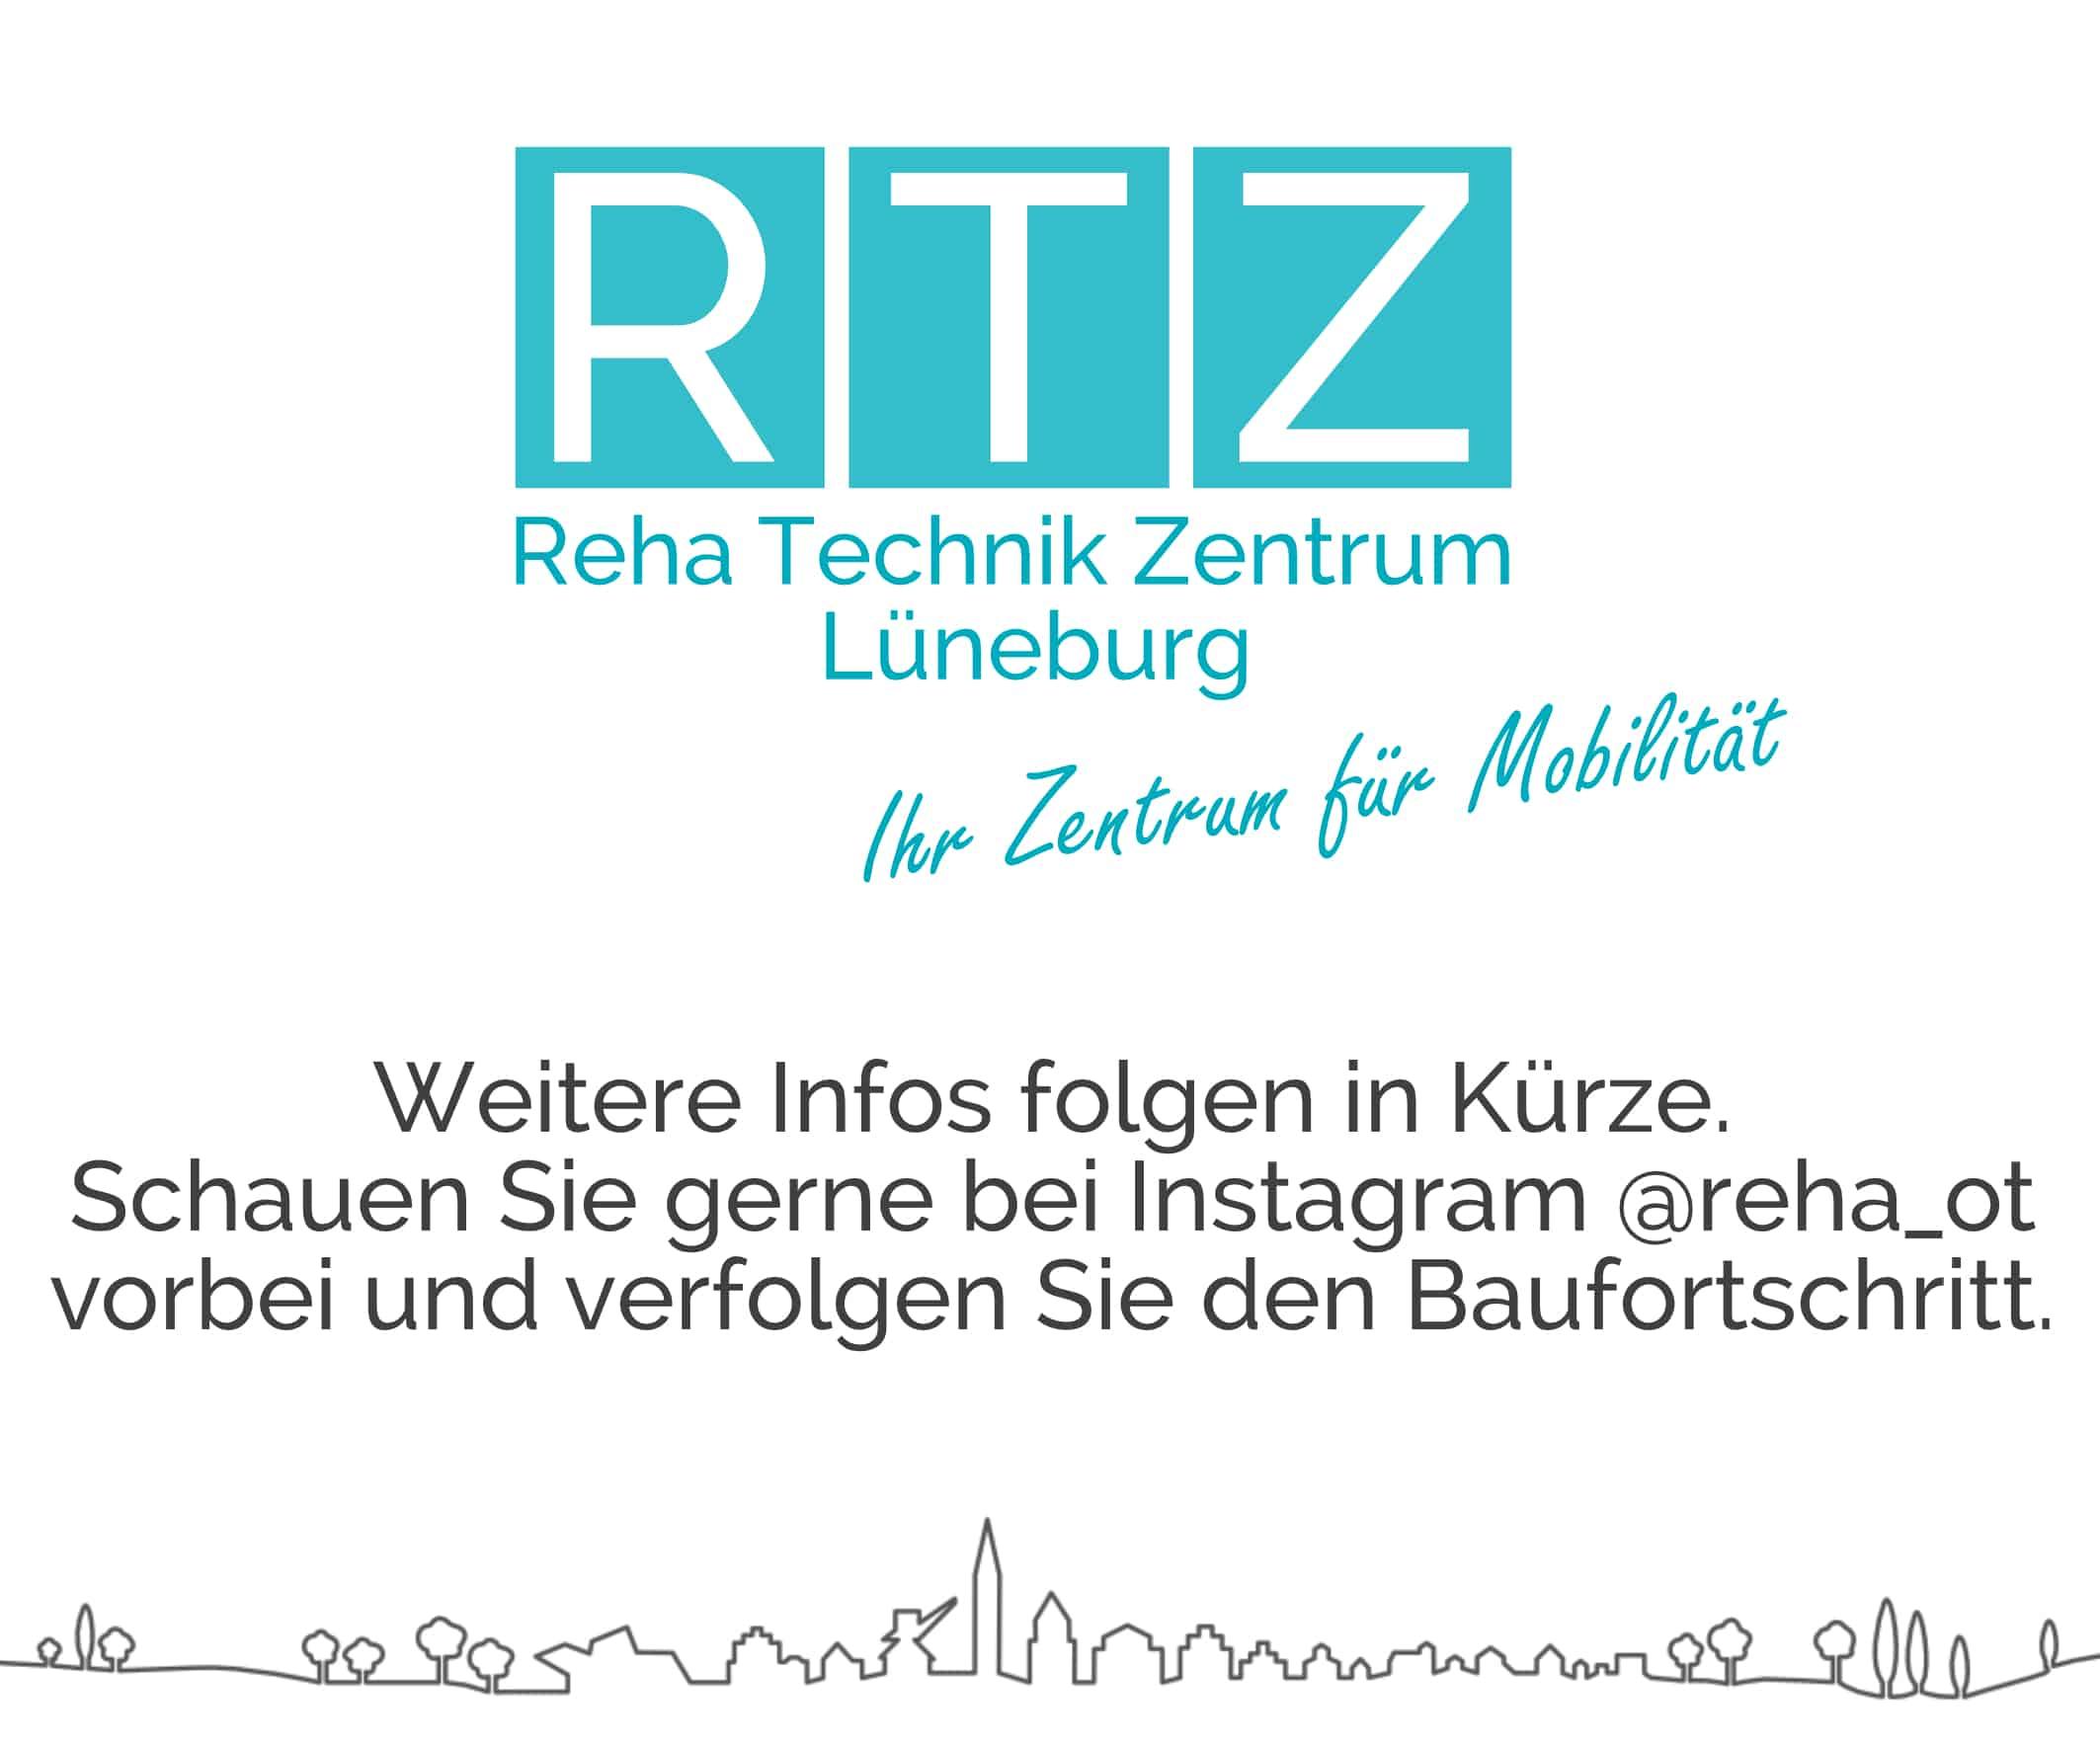 RTZ Reha Technik Zentrum Lüneburg Logo